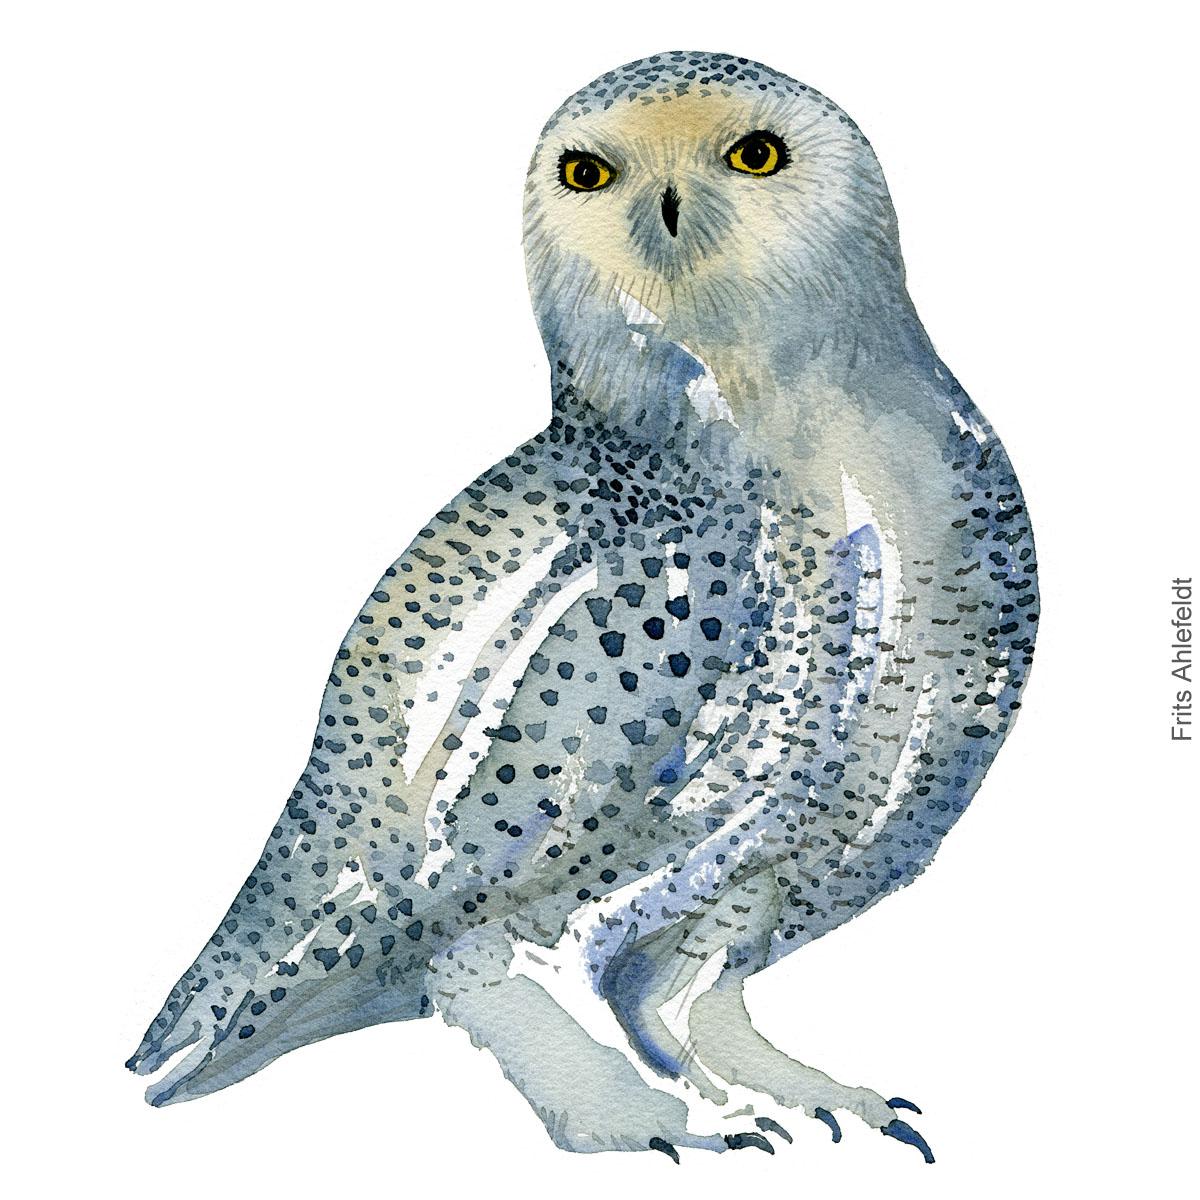 Snowy owl - Sneugle Akvarel. Watercolor bird illustration by Frits Ahlefeldt